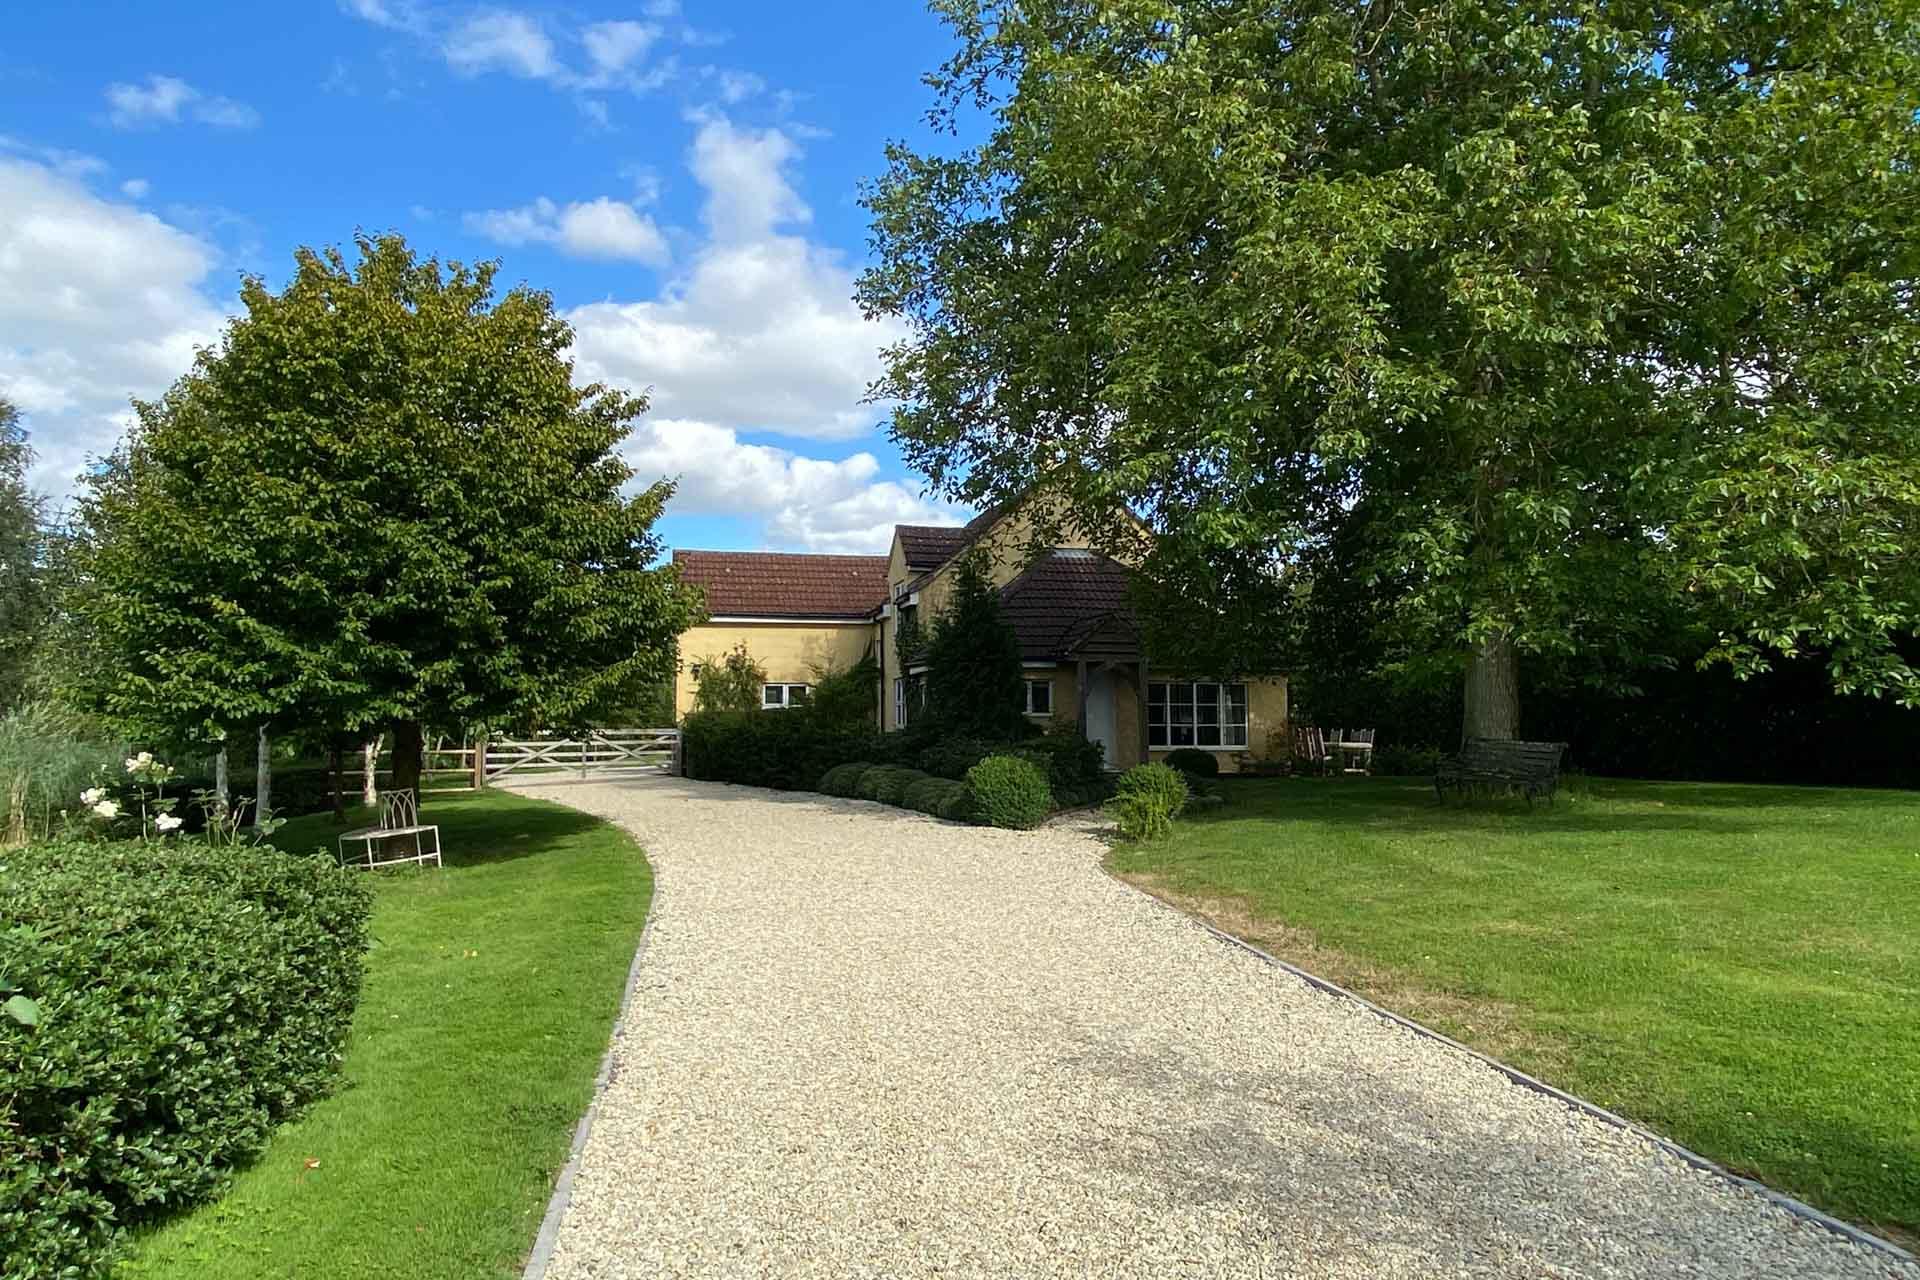 inglestone-farm-ginas-cottage33